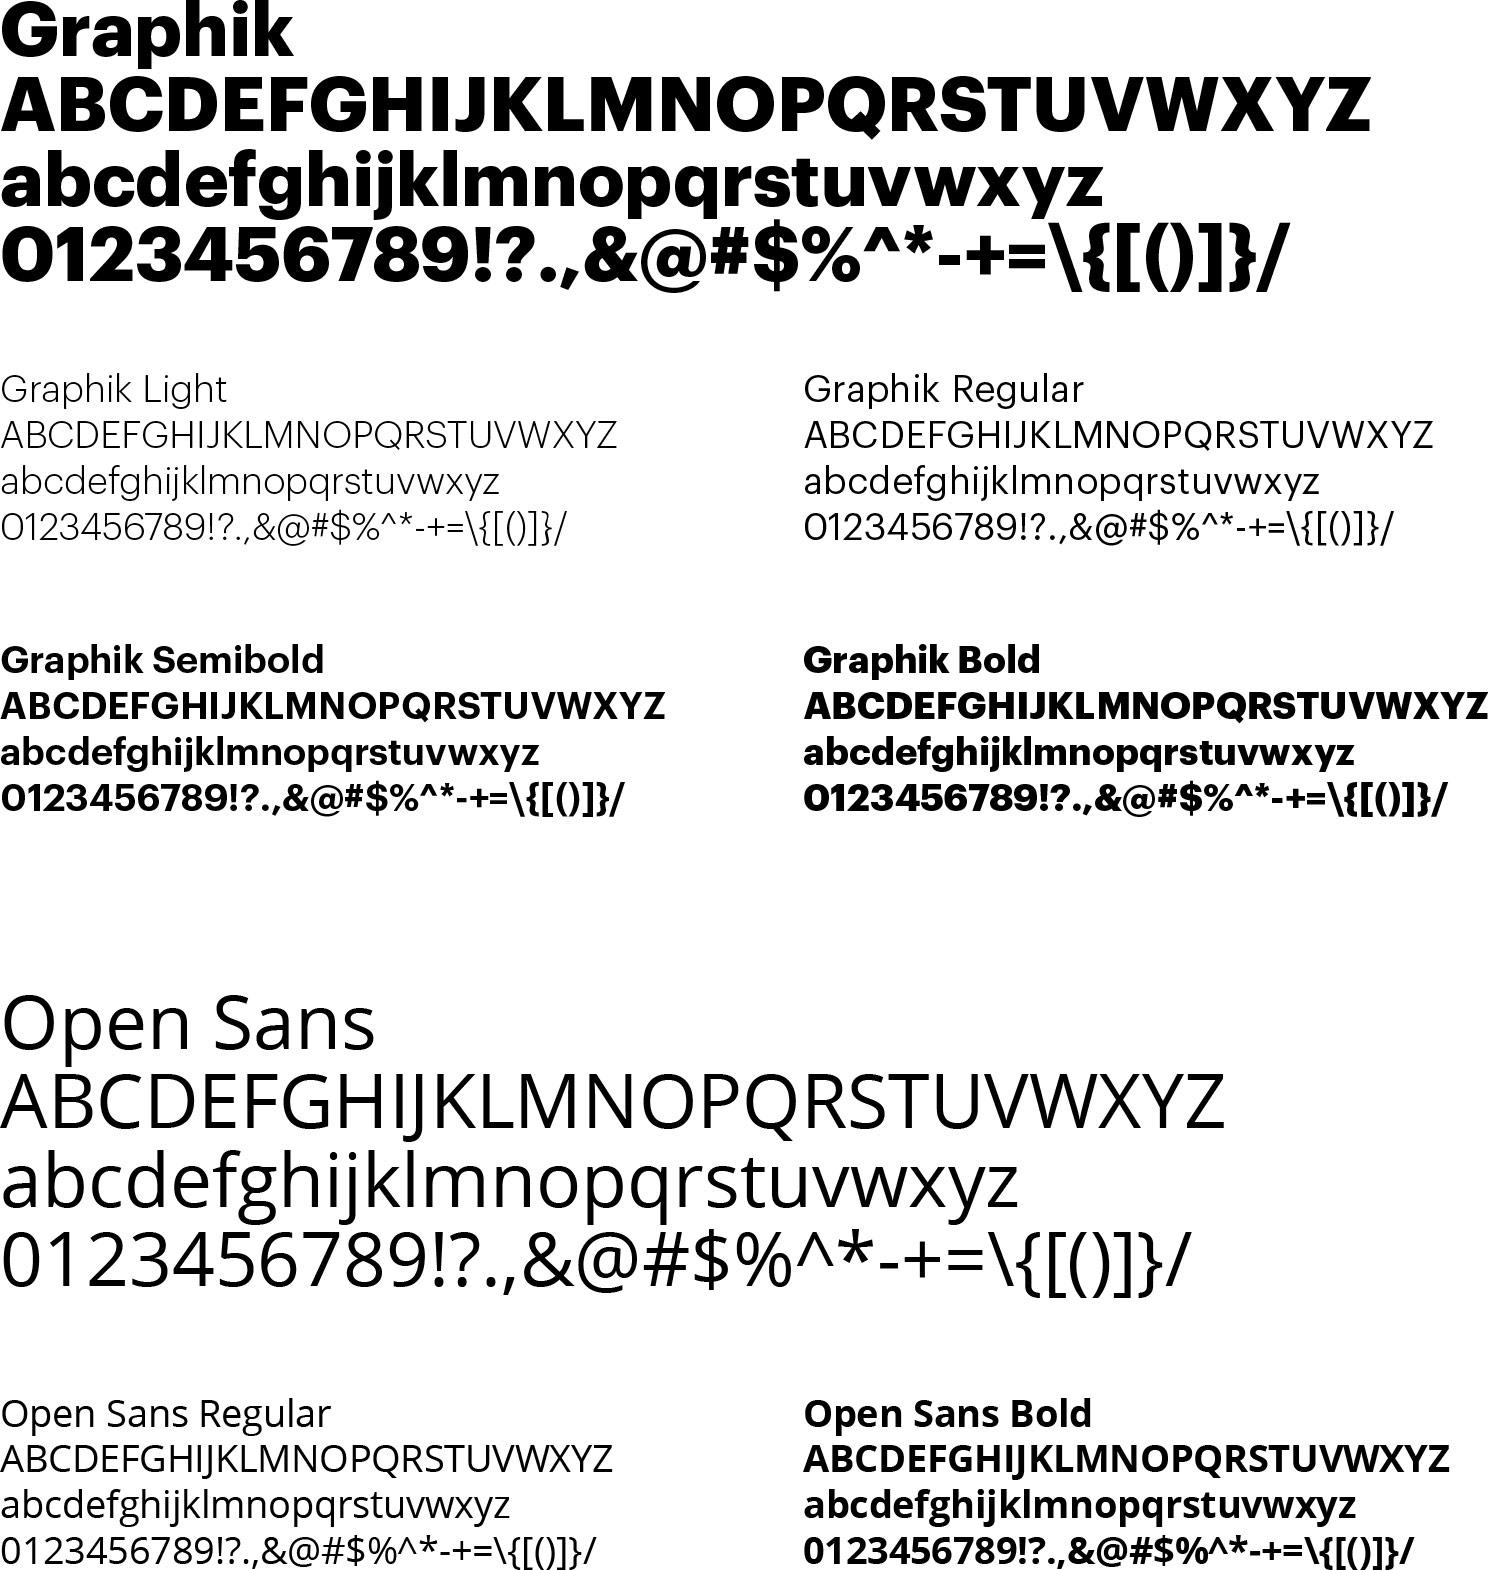 upwave_typography.jpg